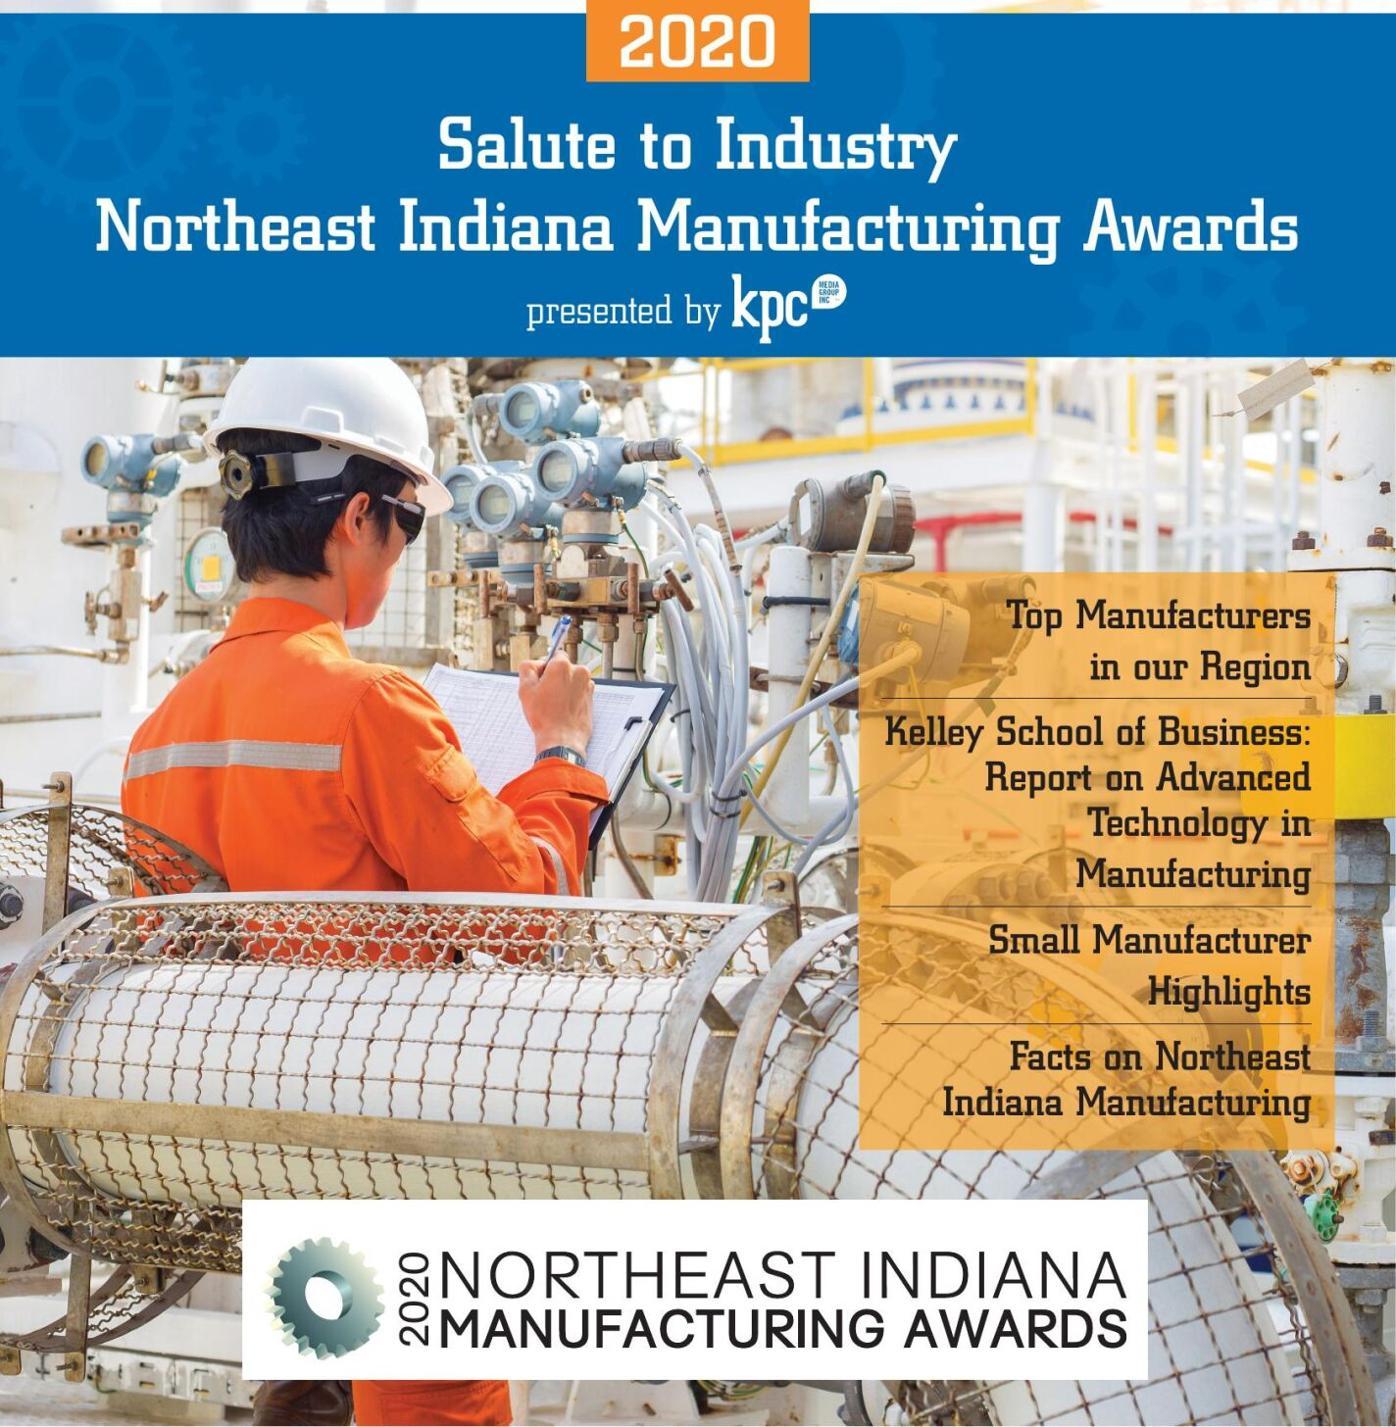 2020 Northeast Indiana Manufacturing Awards